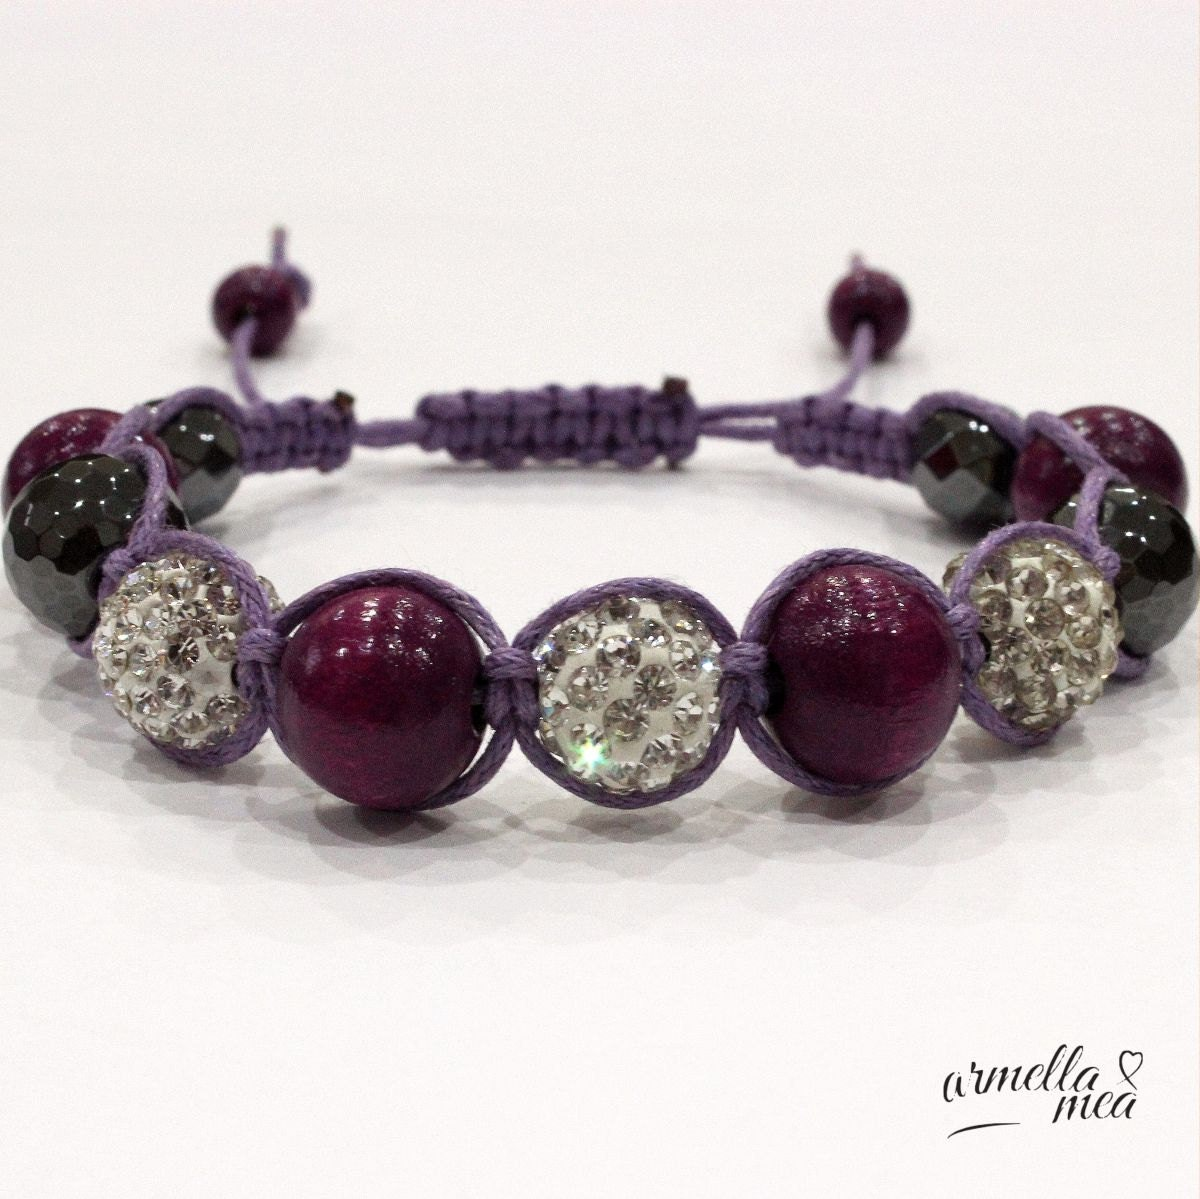 bead bracelet macrame bracelet pattern macrame